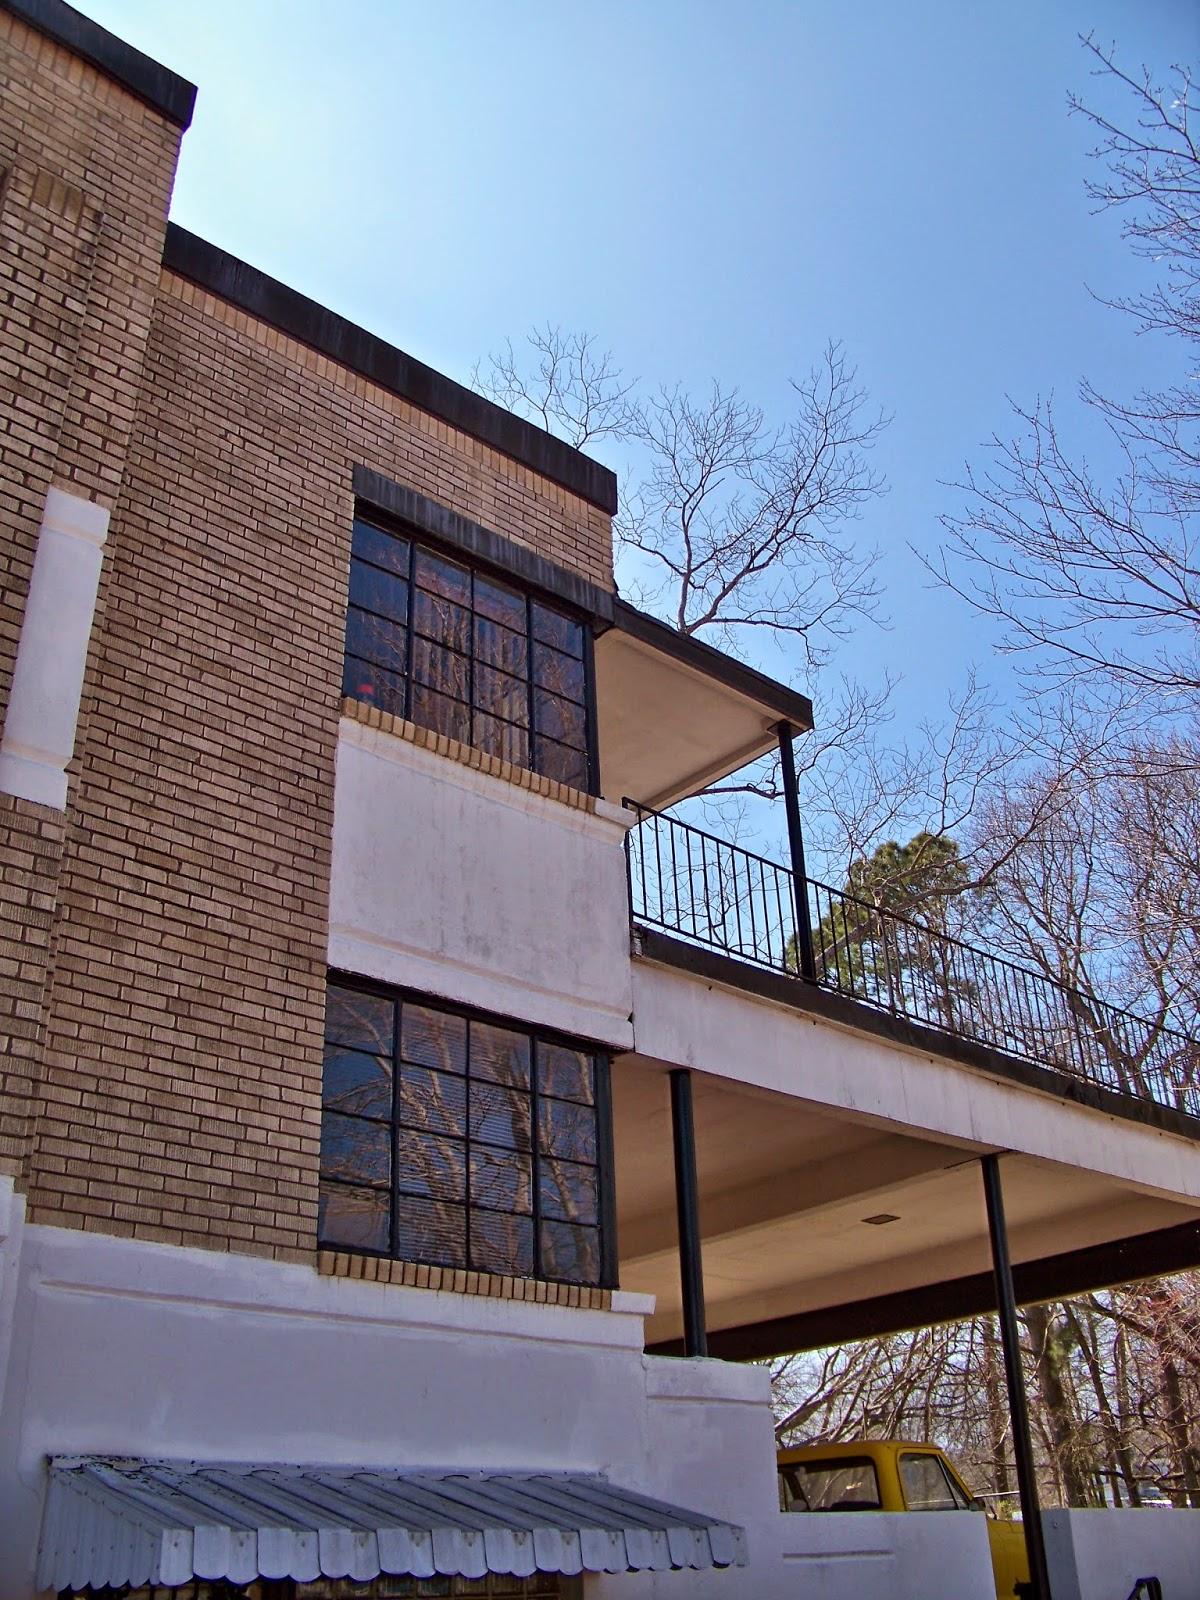 The loft bauhaus exterior